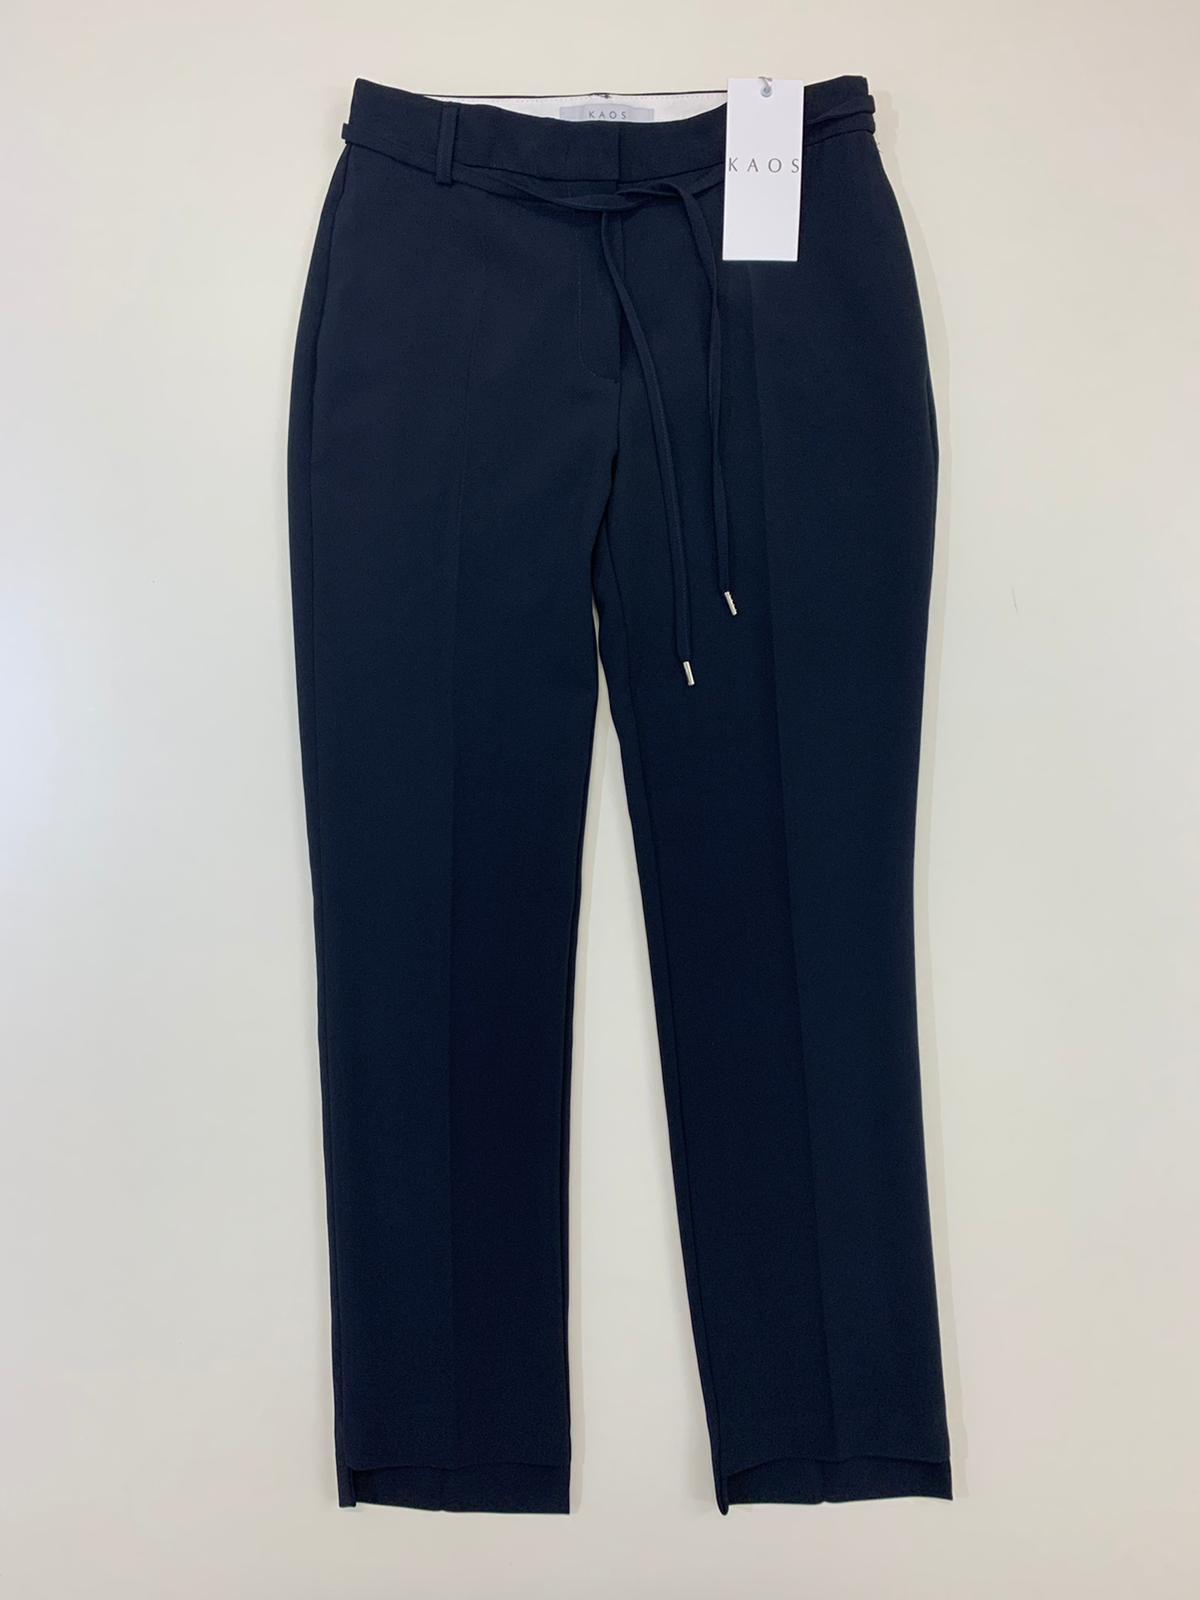 Pantalone Donna Kaos Collection Sigaretta Blu